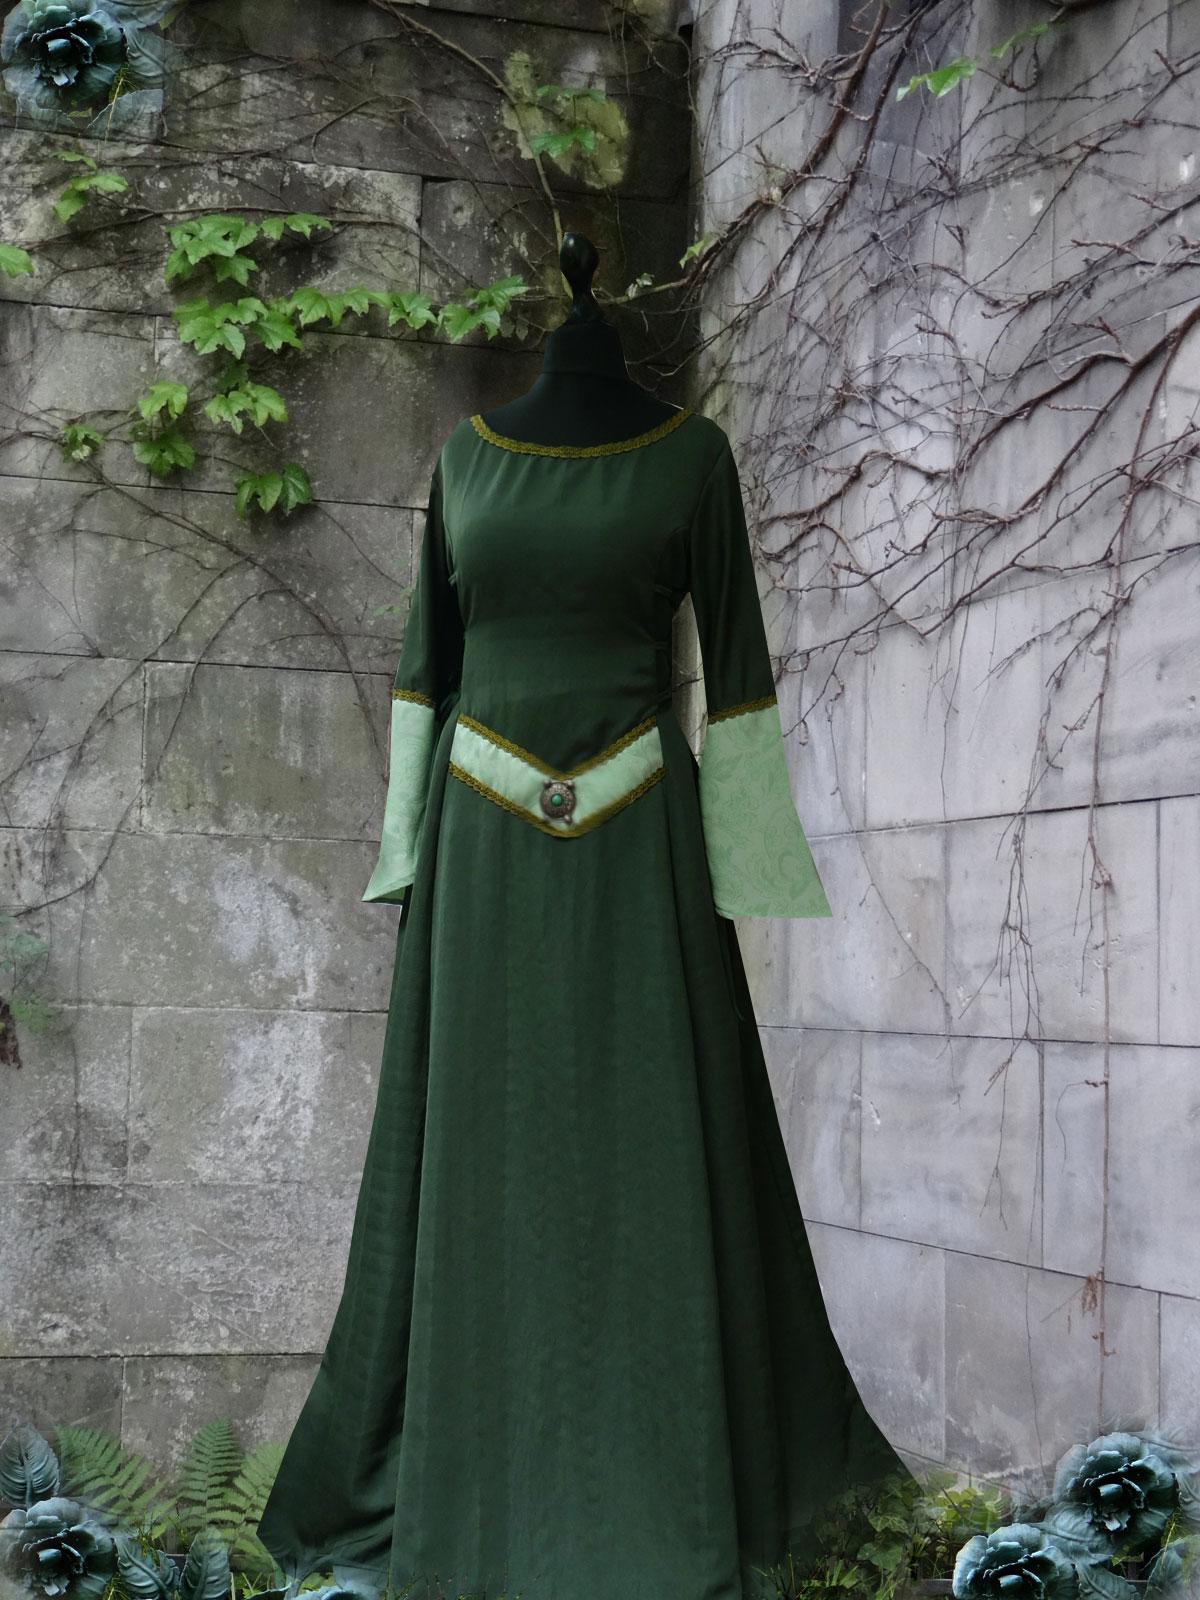 Waldelfenkleid türkis grün Elfengewandung Elfenkleid Mittelaltergewand